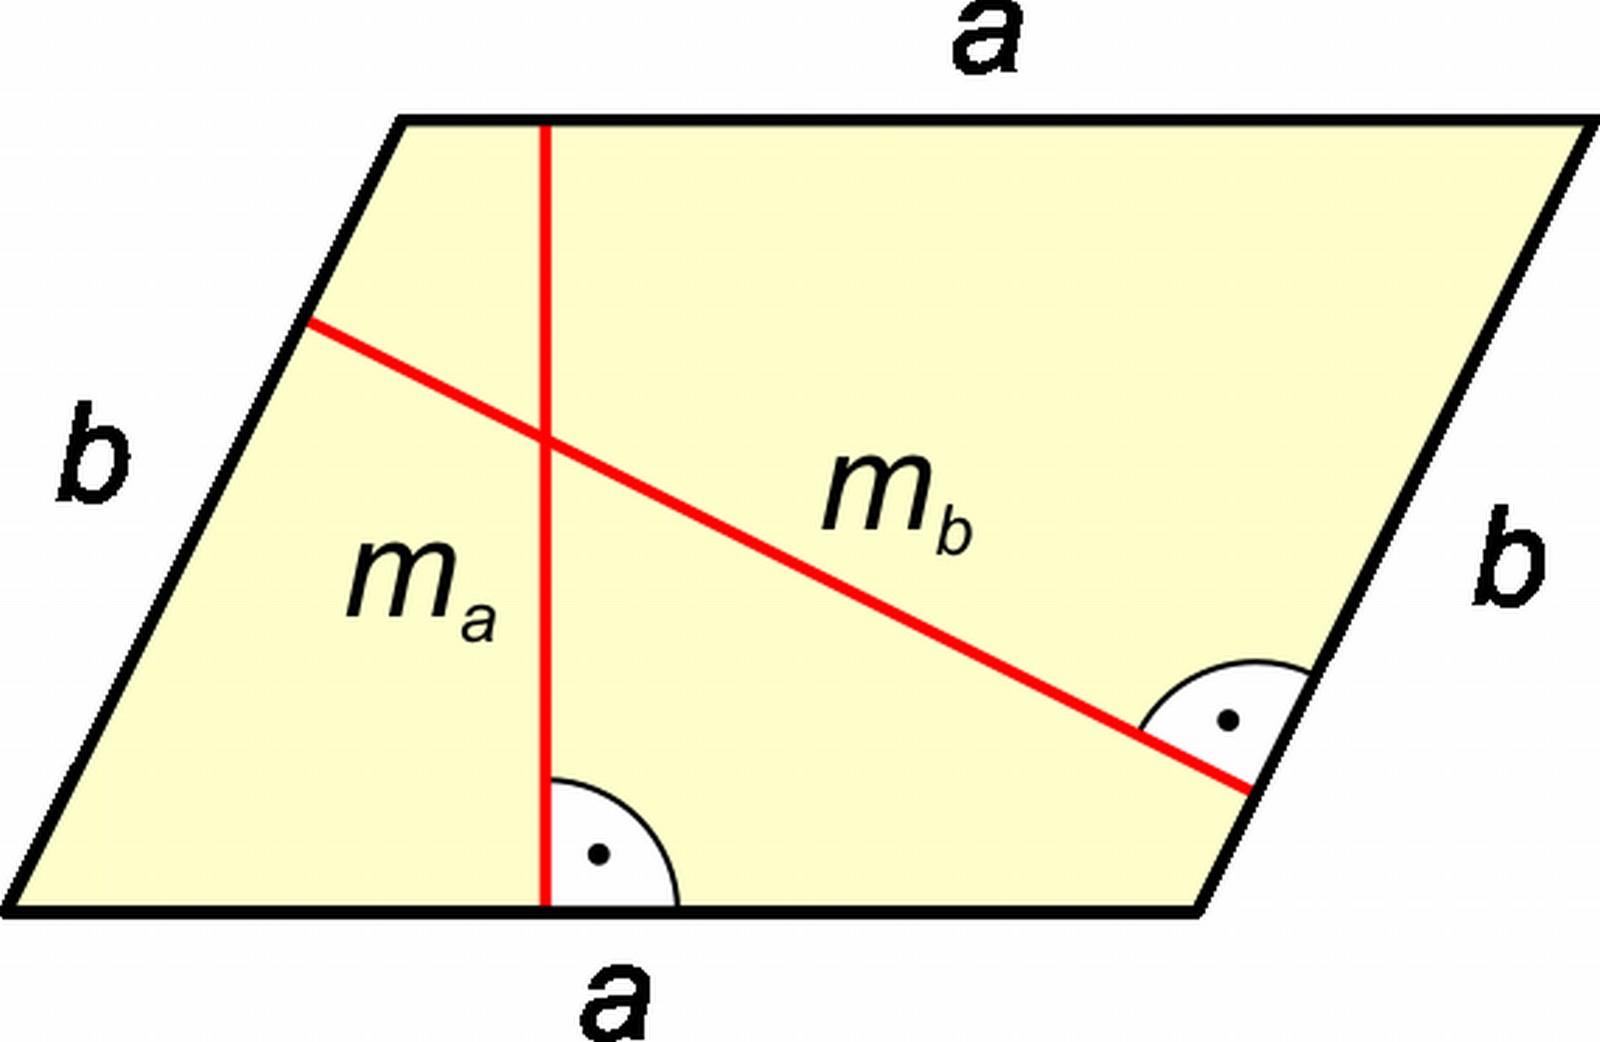 Paralelogramma magassága